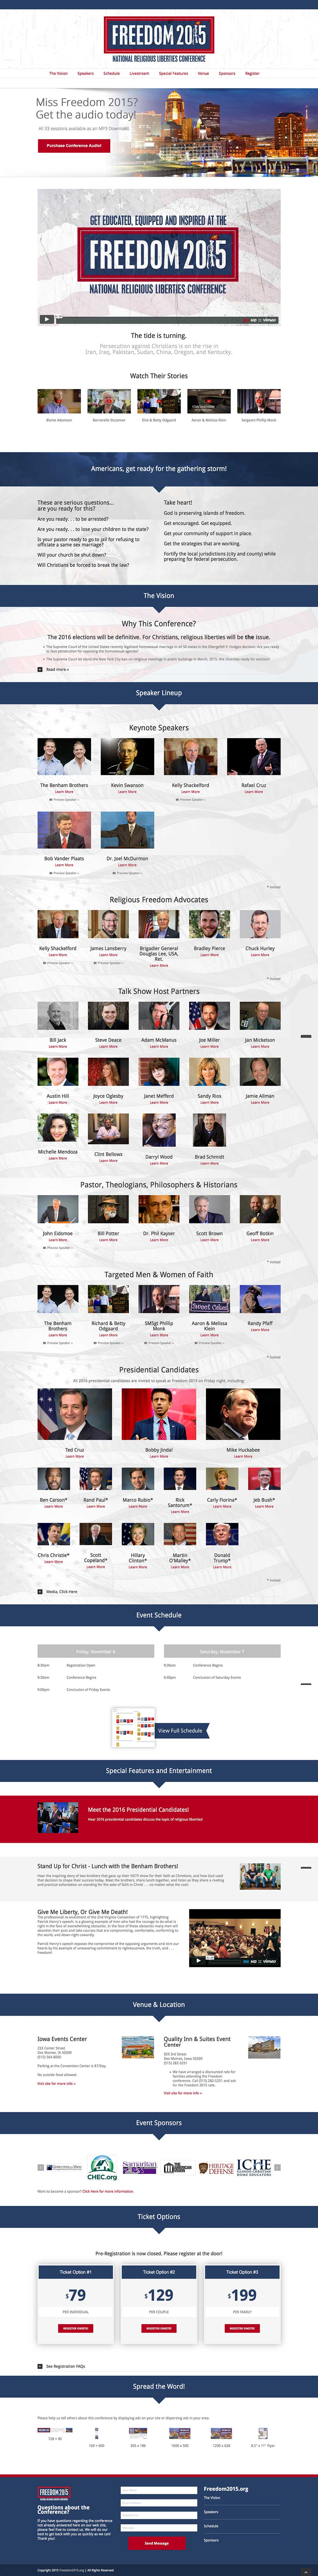 freedom2015-website